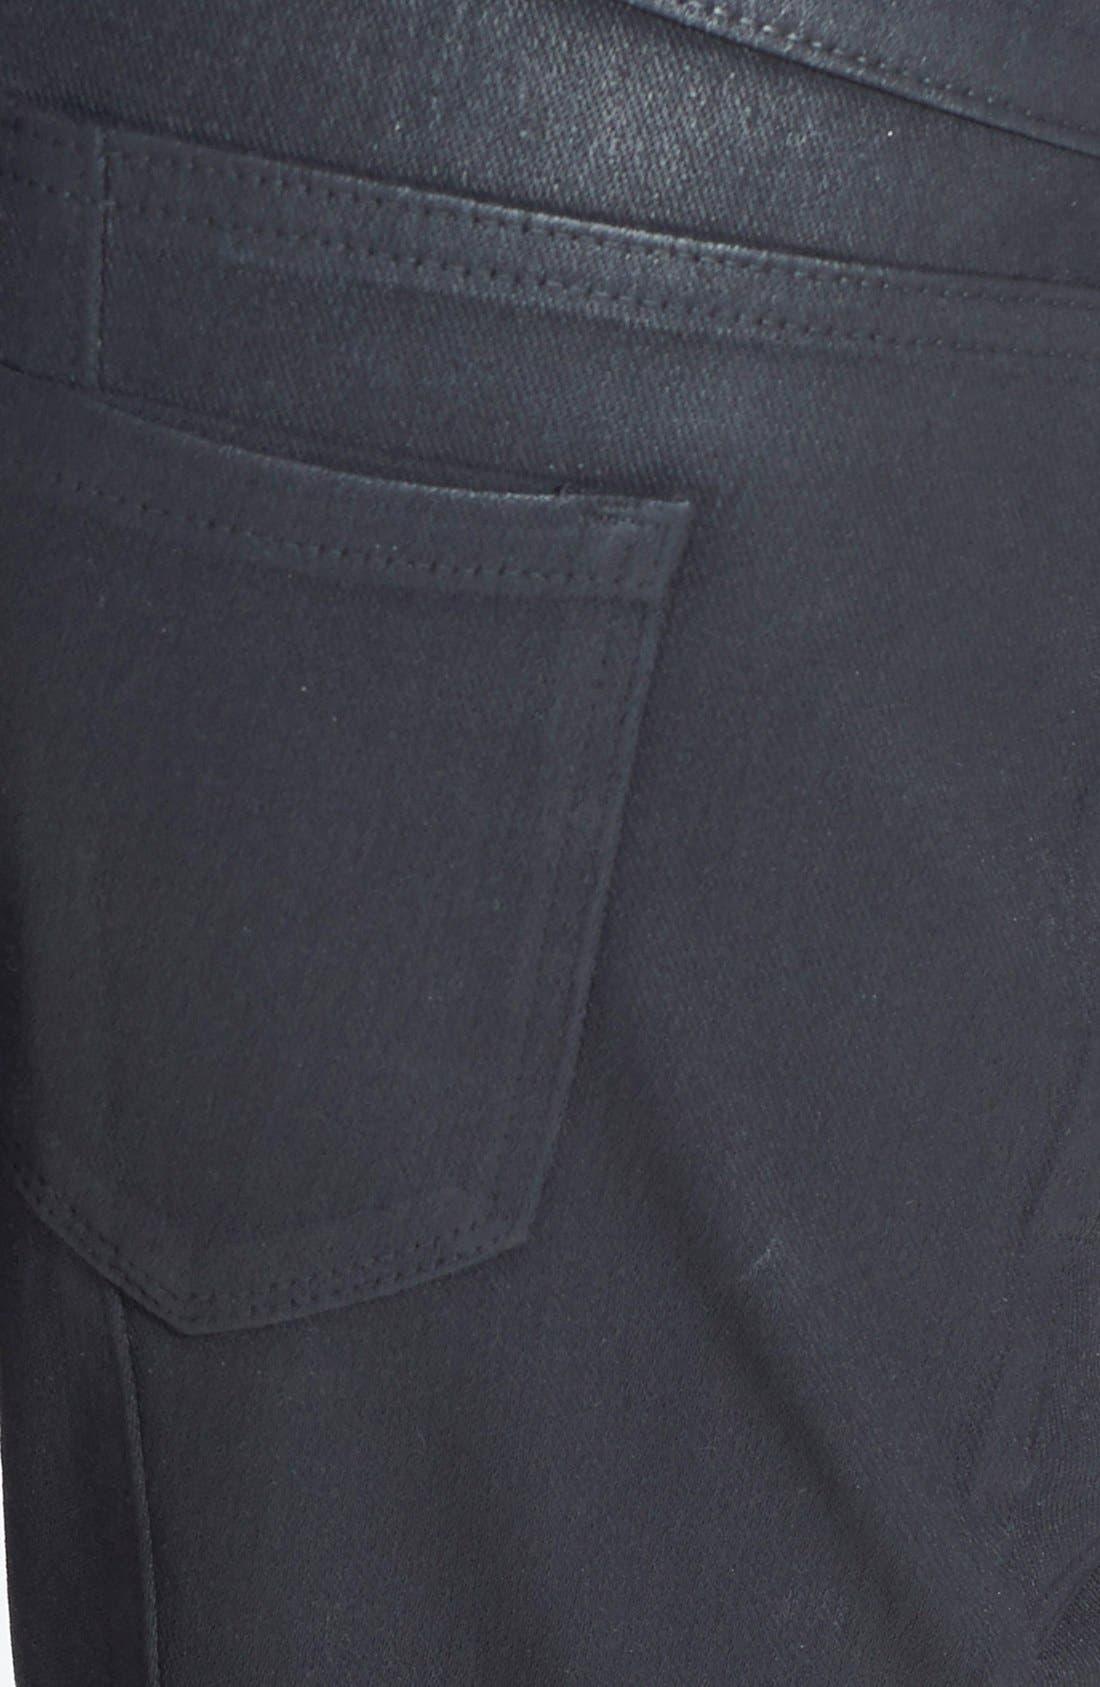 Alternate Image 3  - Kiind Of Jogger Skinny Pants